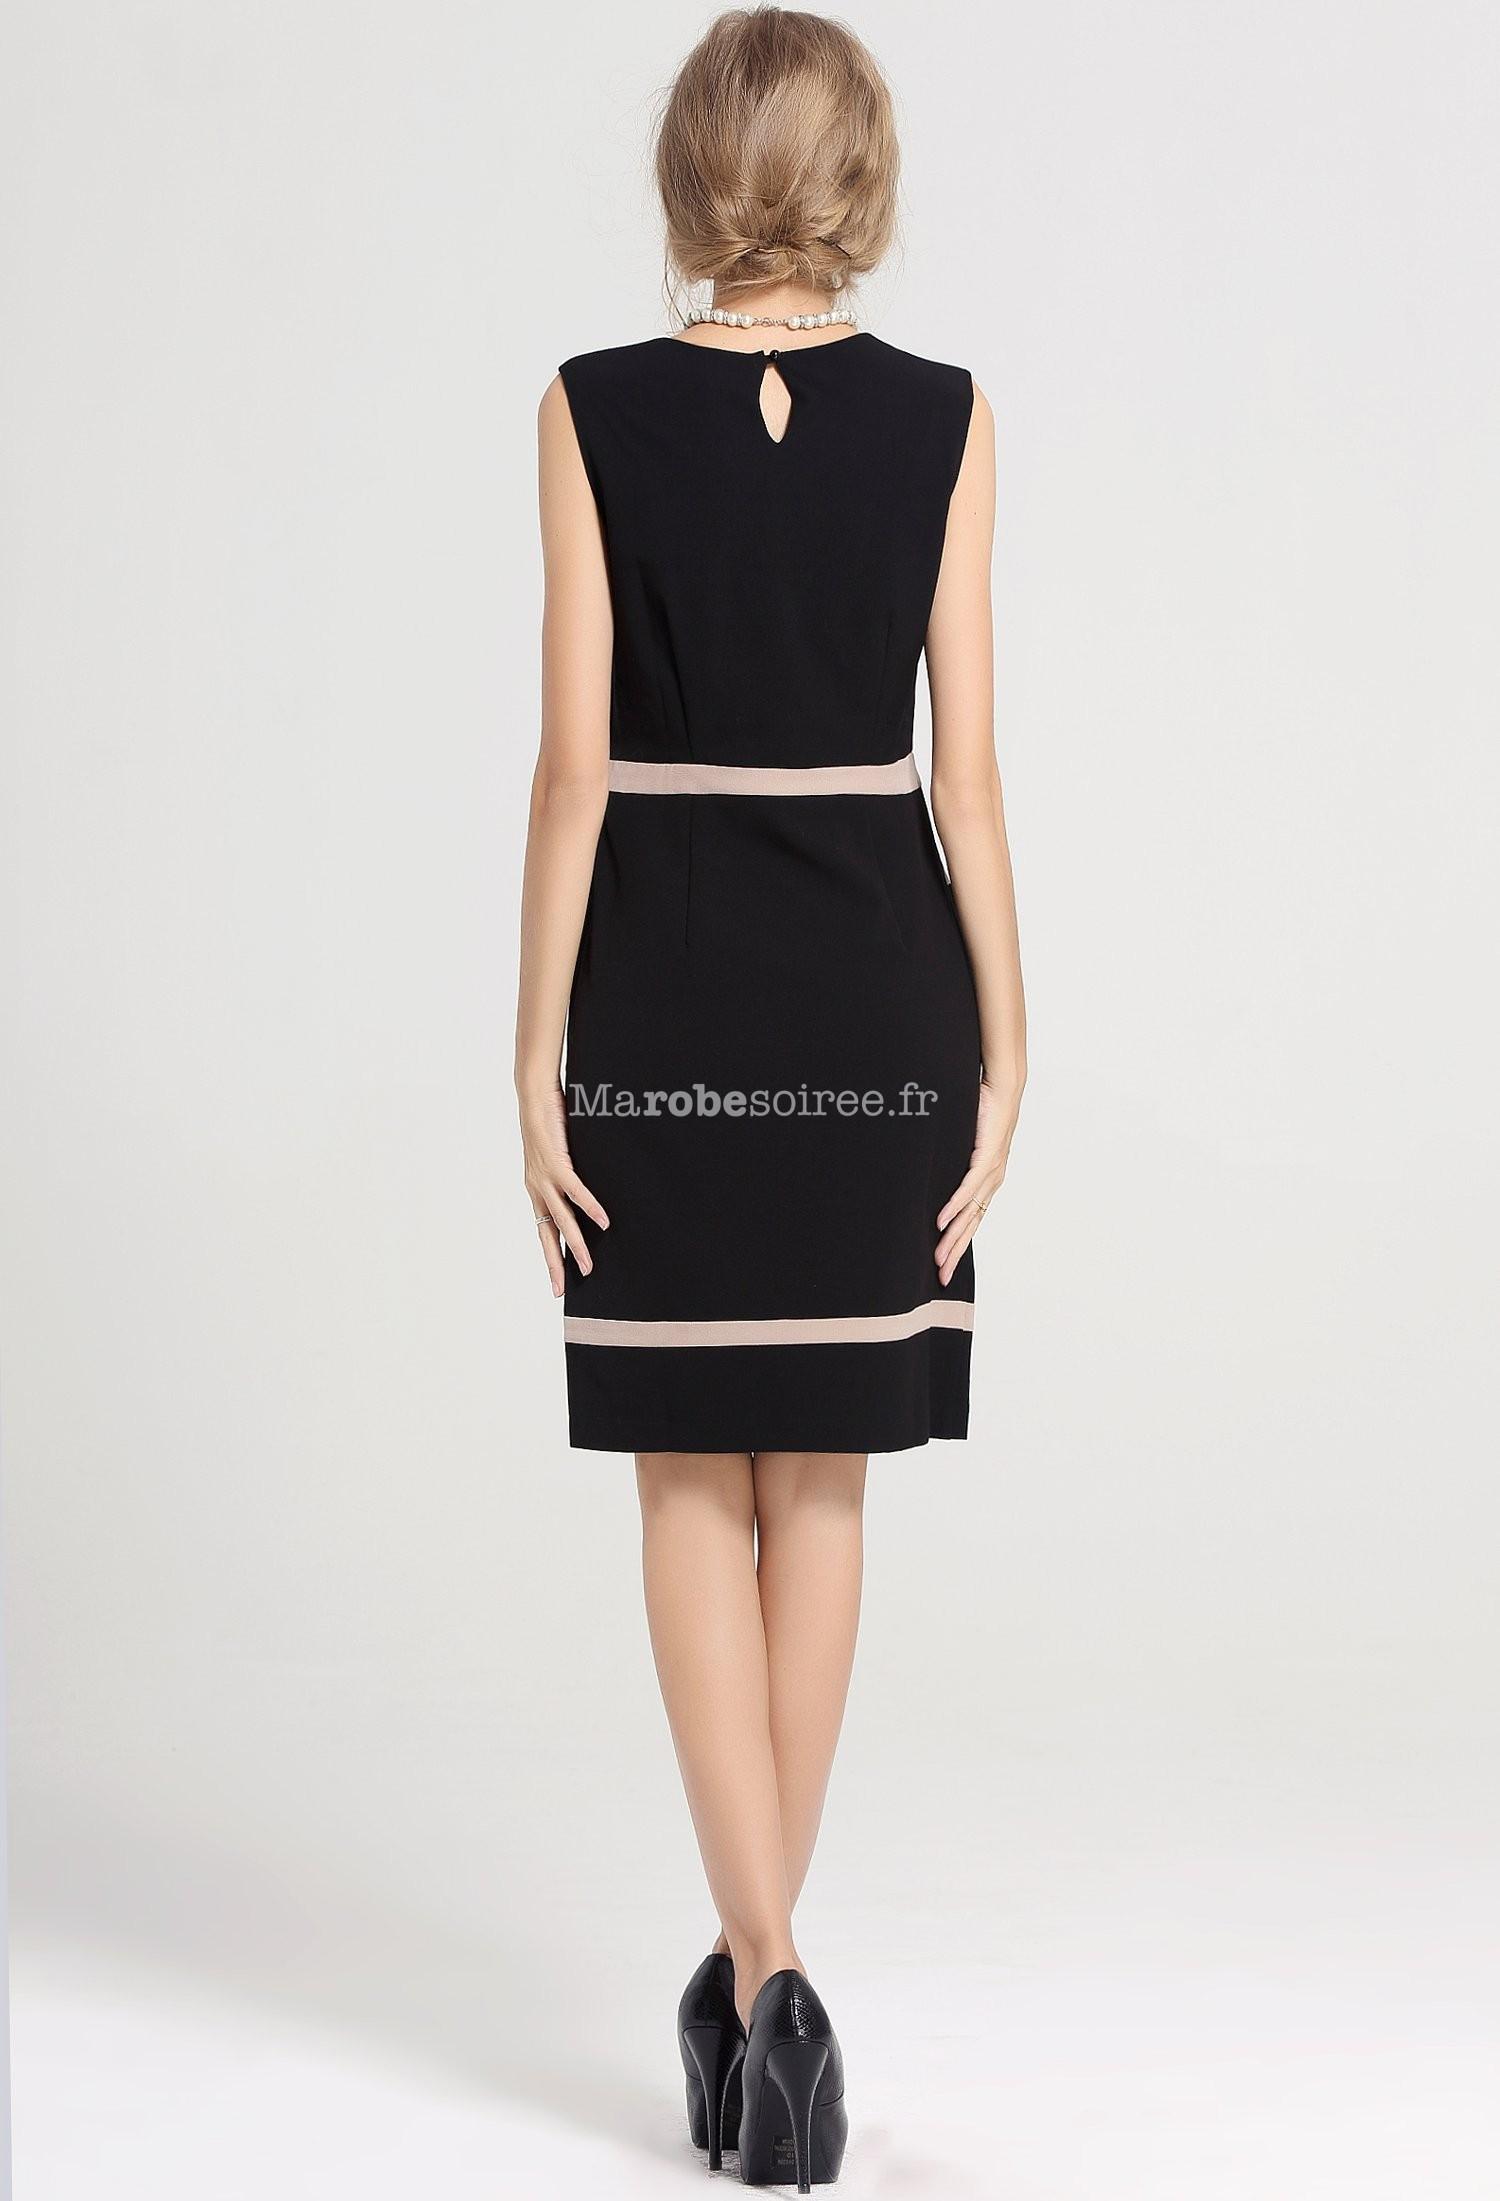 petite robe noire coupe droite must have. Black Bedroom Furniture Sets. Home Design Ideas